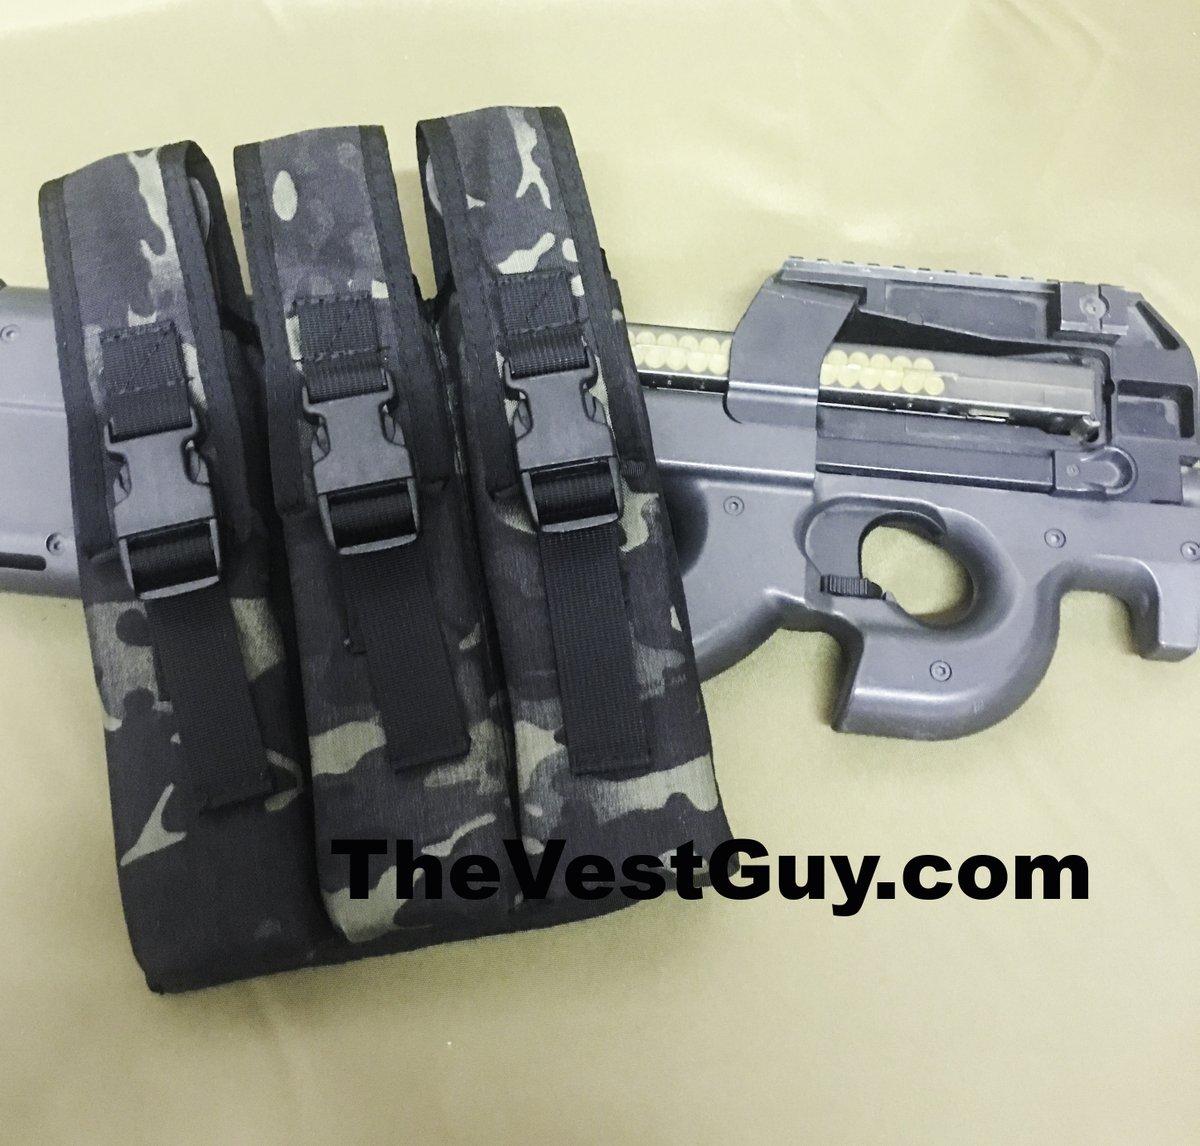 https://youtu.be/KsPiv-6rL4E  https://thevestguy.com/collections/tactical-vests/products/10141-p90-tactical-vest…  https://thevestguy.com/collections/tactical-vests/products/50027-p90-prepper-vest…  #P90 #Prepper #Tacvest #tactical #Ammo #Guns #GunsandAmmo #2ndamendment  #secondamendment  #NRA #P90Vest #VestReview #Review #firearms #gun #vest #vests #thevestguy #fnp90 #slings #sling   #MadeinUSApic.twitter.com/BFq7YcCUm1